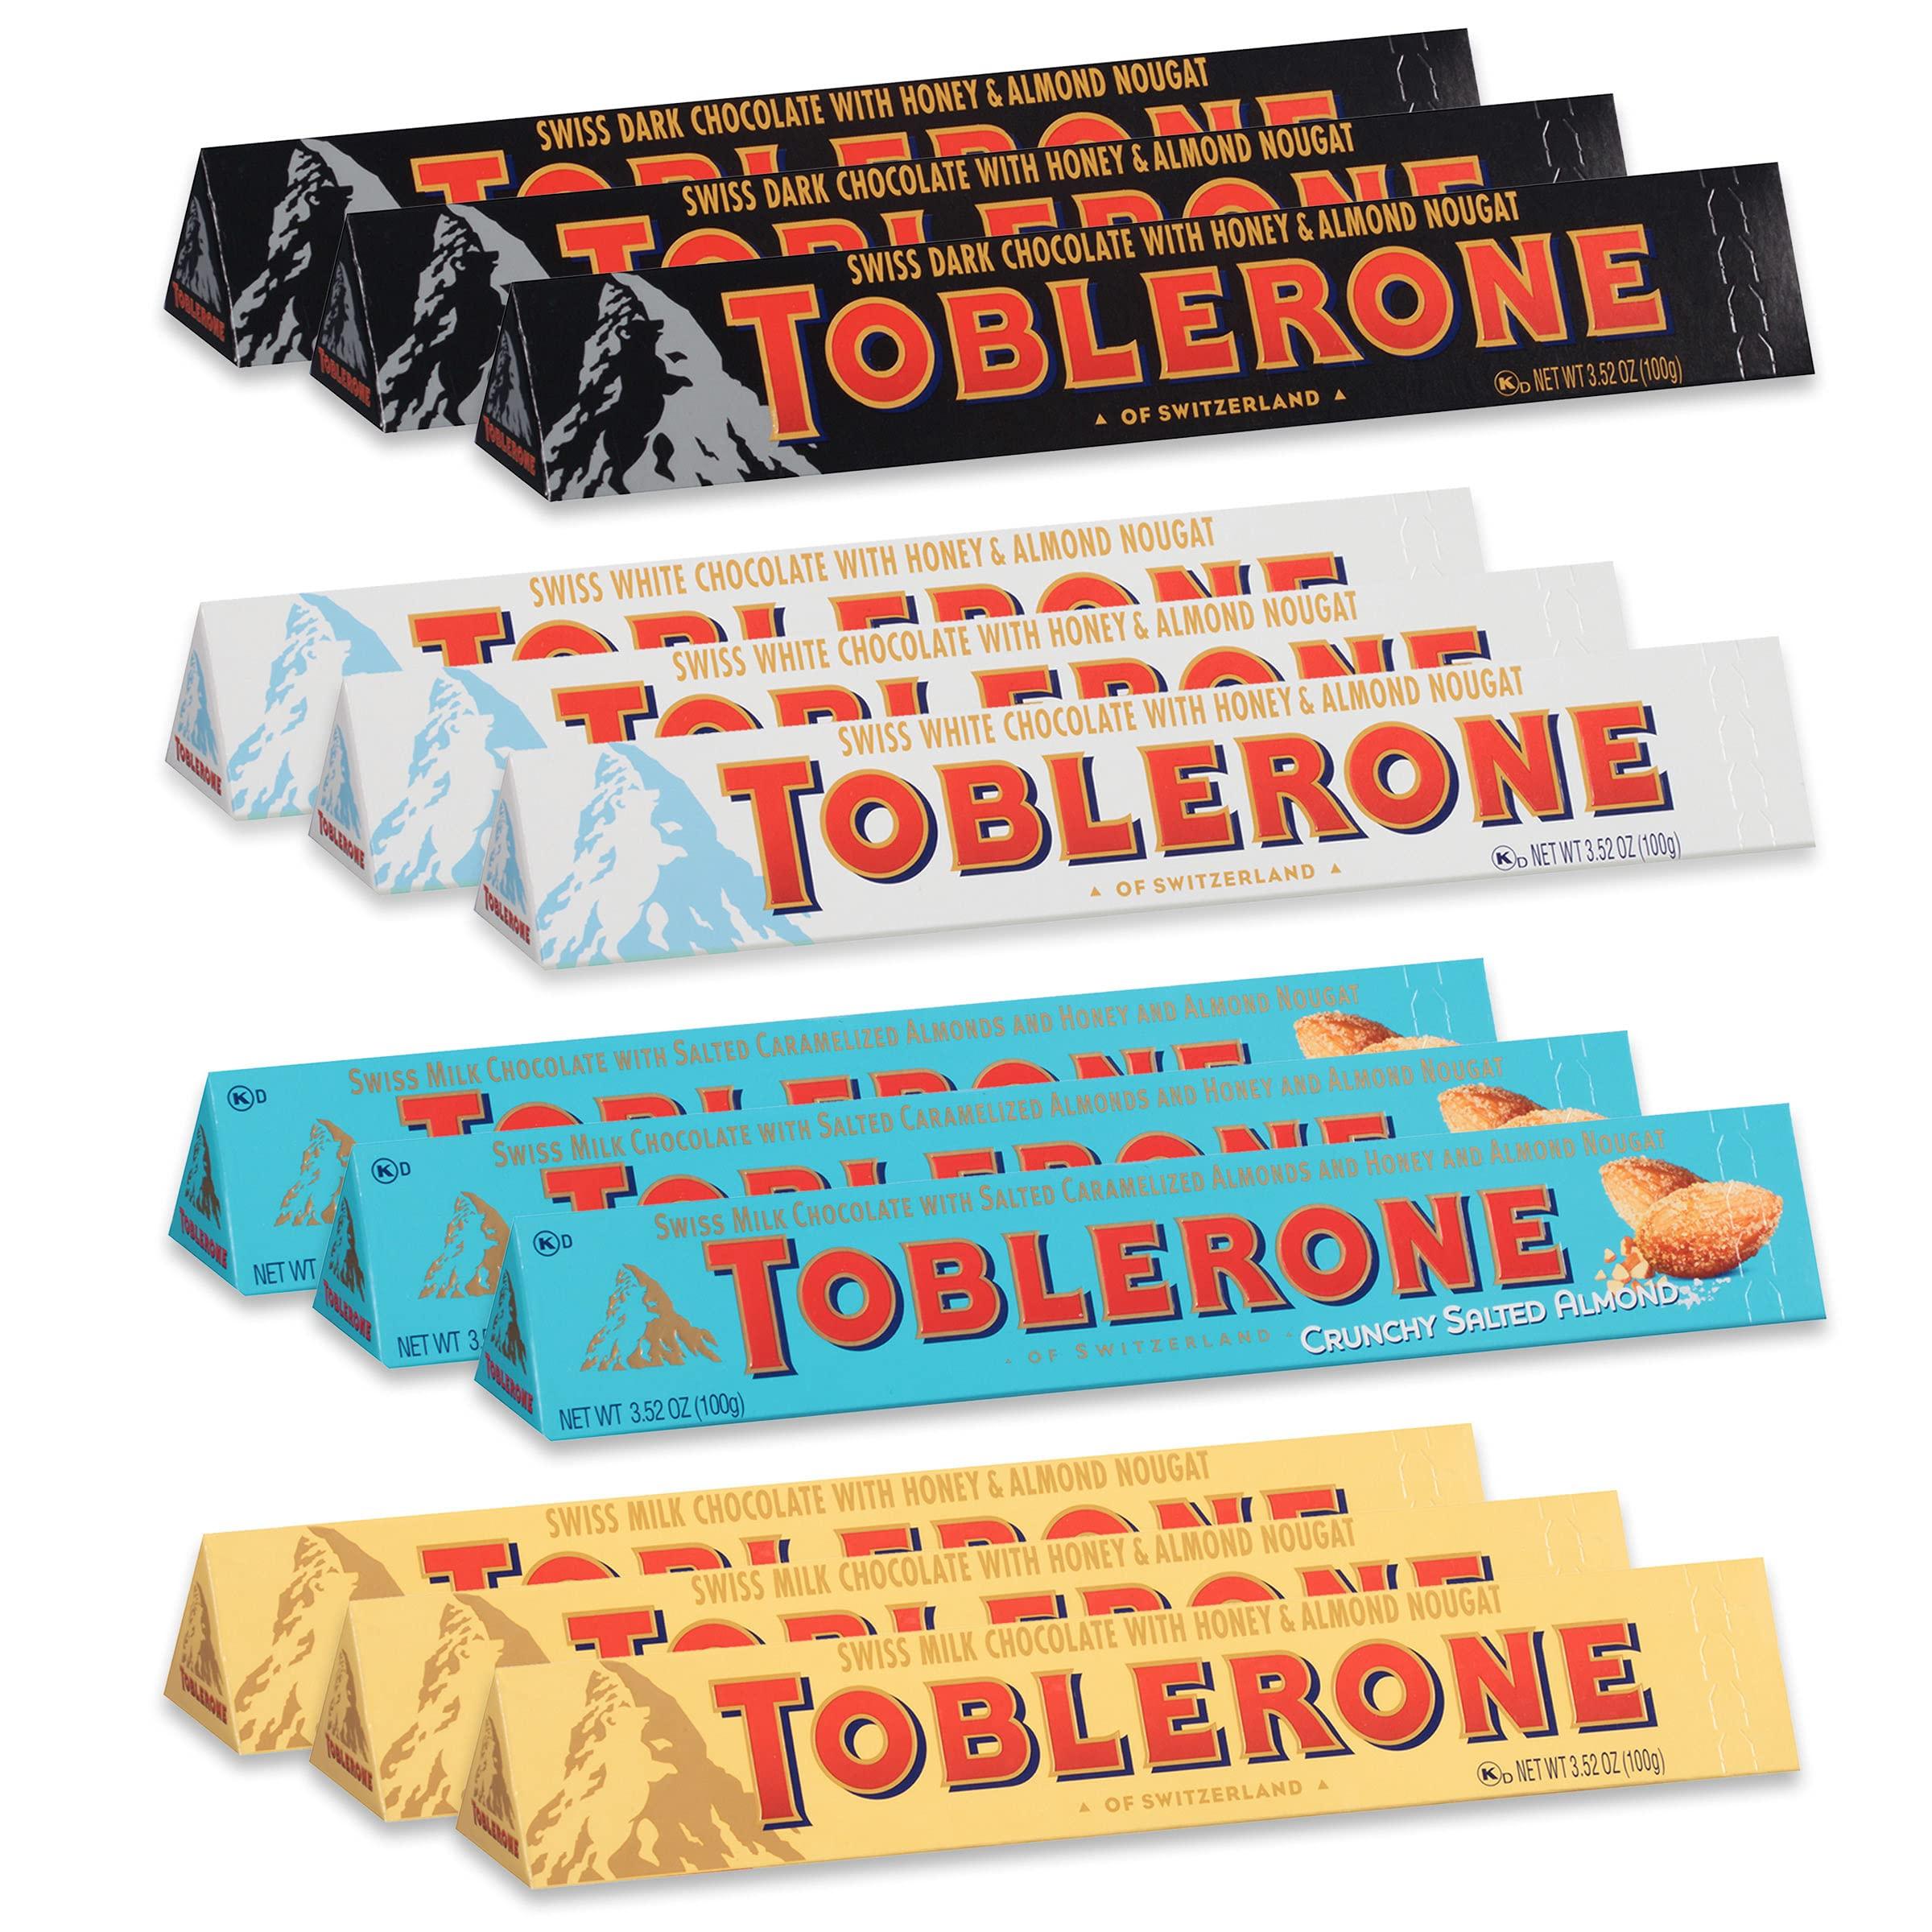 Toblerone Swiss Chocolate Variety Pack, Milk Chocolate, Dark Chocolate, White Chocolate & Crunchy Salted Caramelized Almond, 12 - 3.52 oz Bars